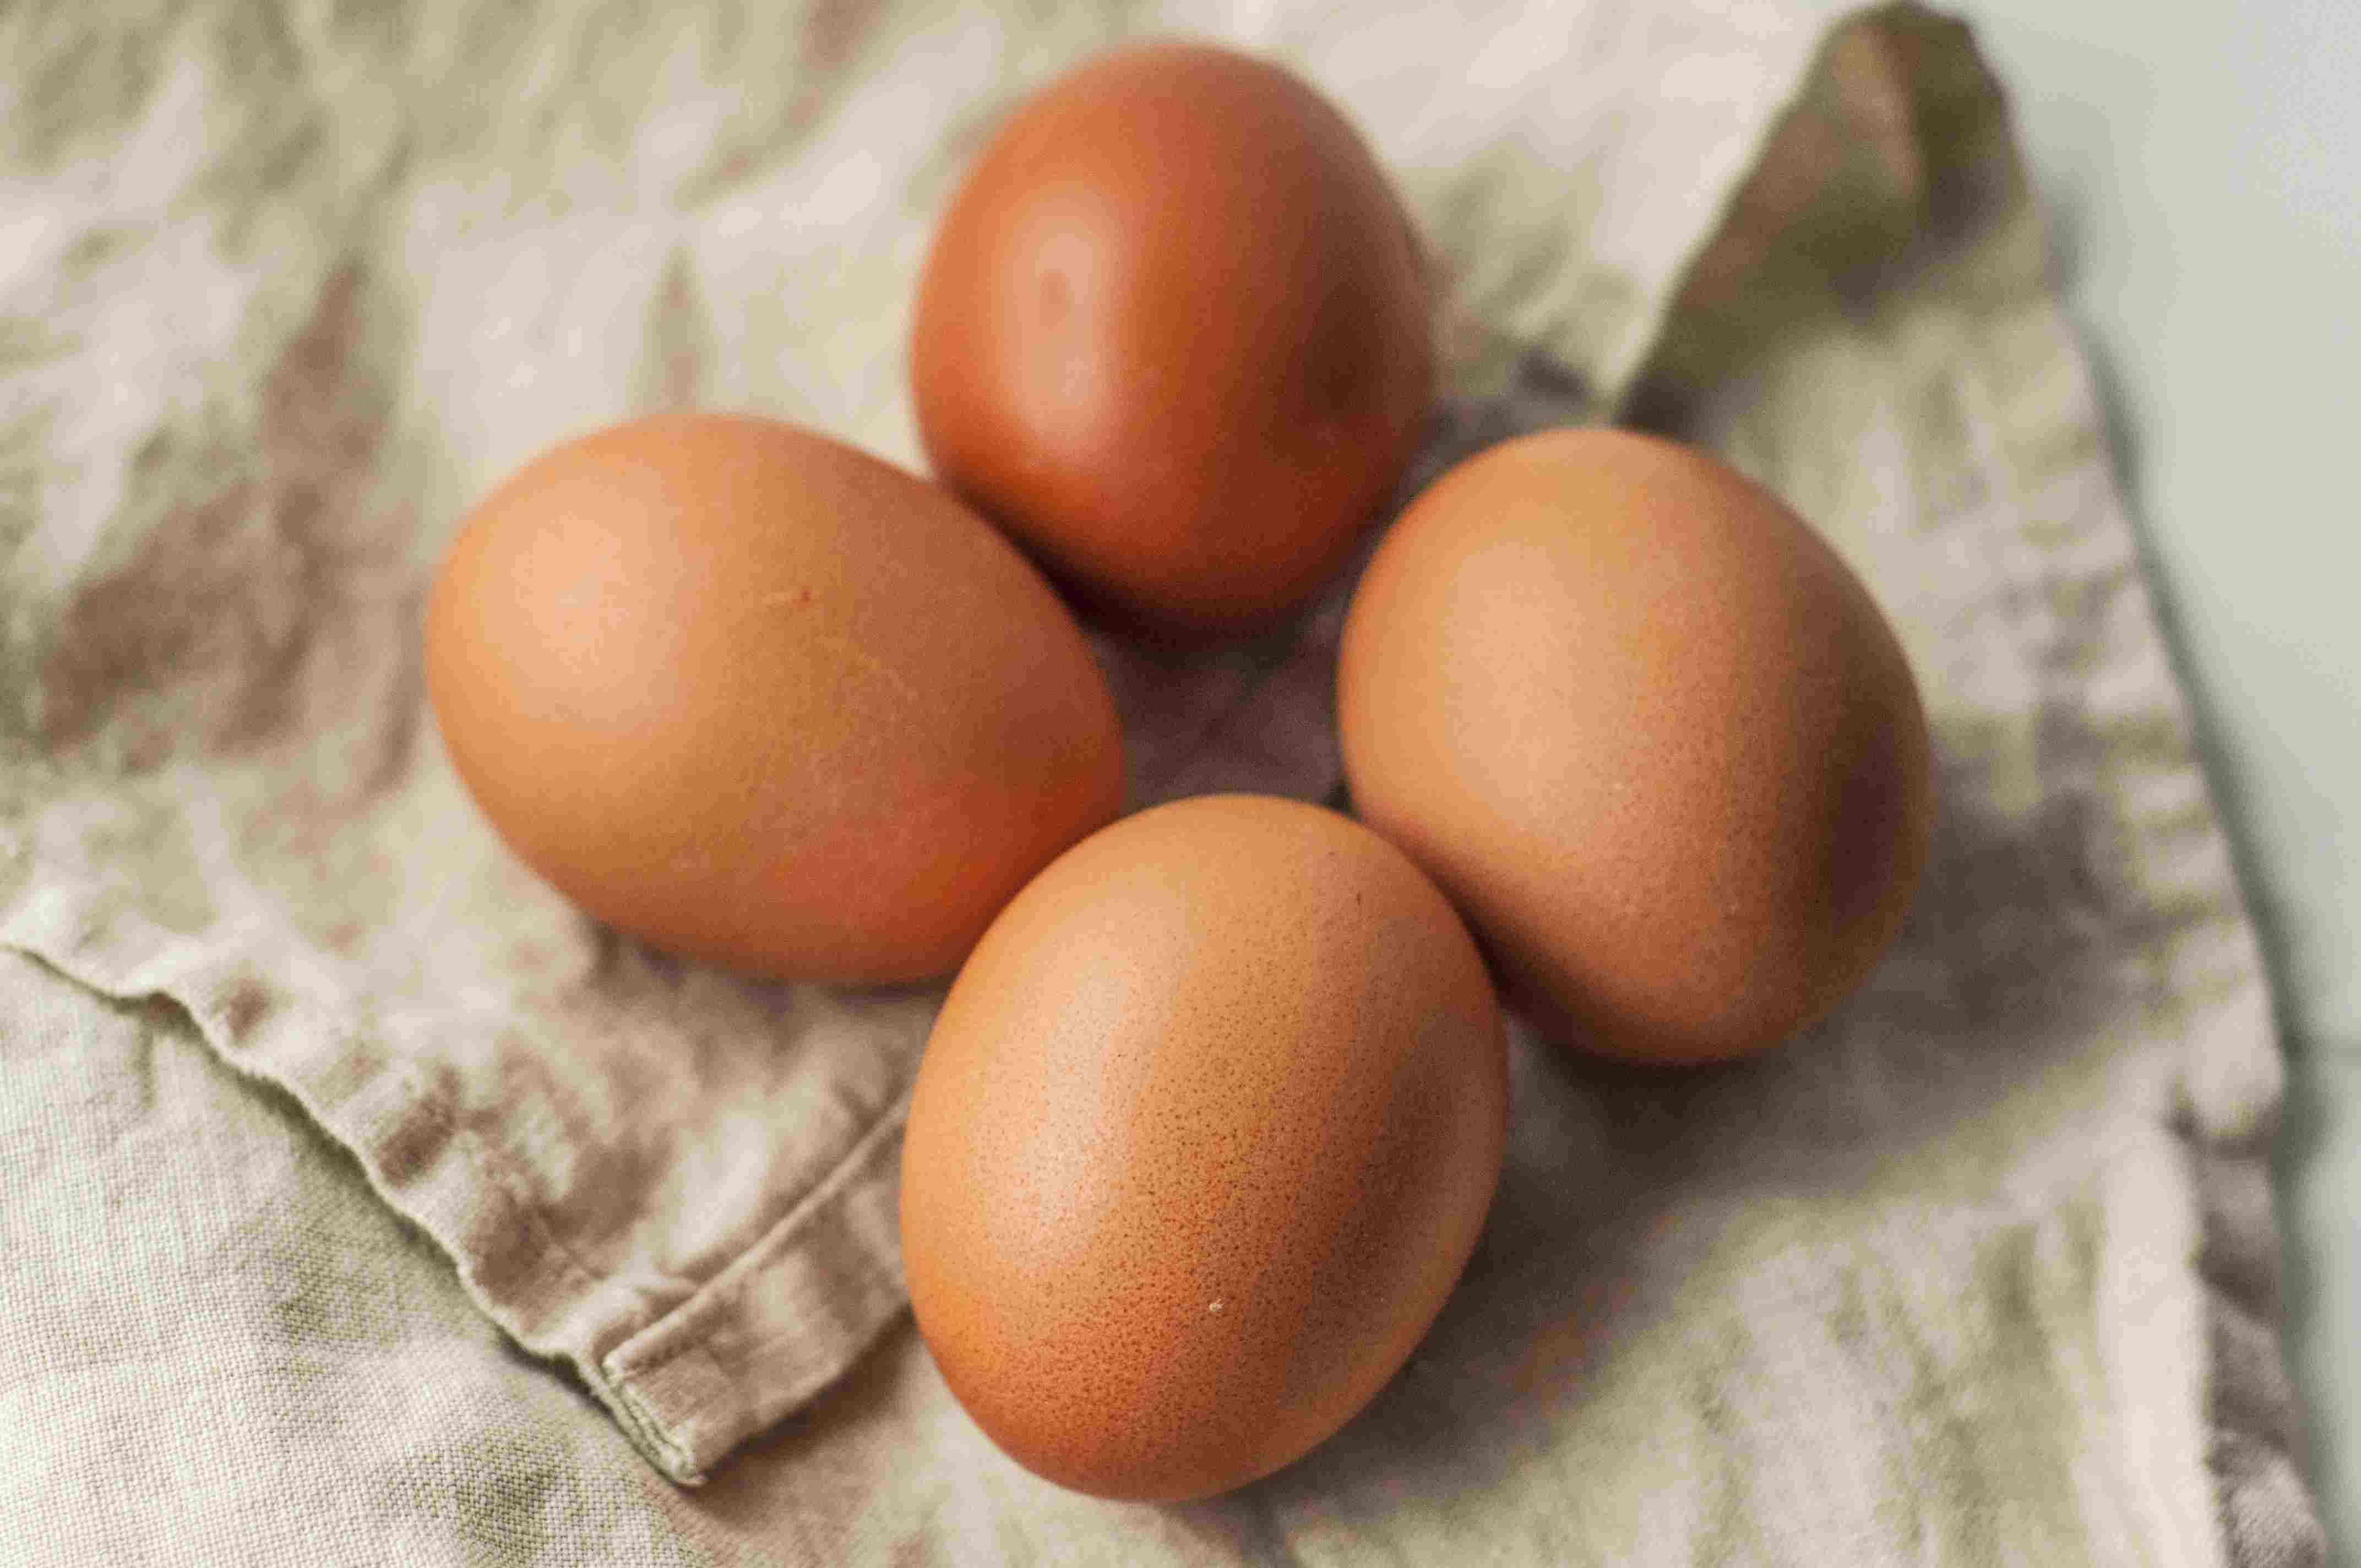 Hard-boiled eggs on a tea towel